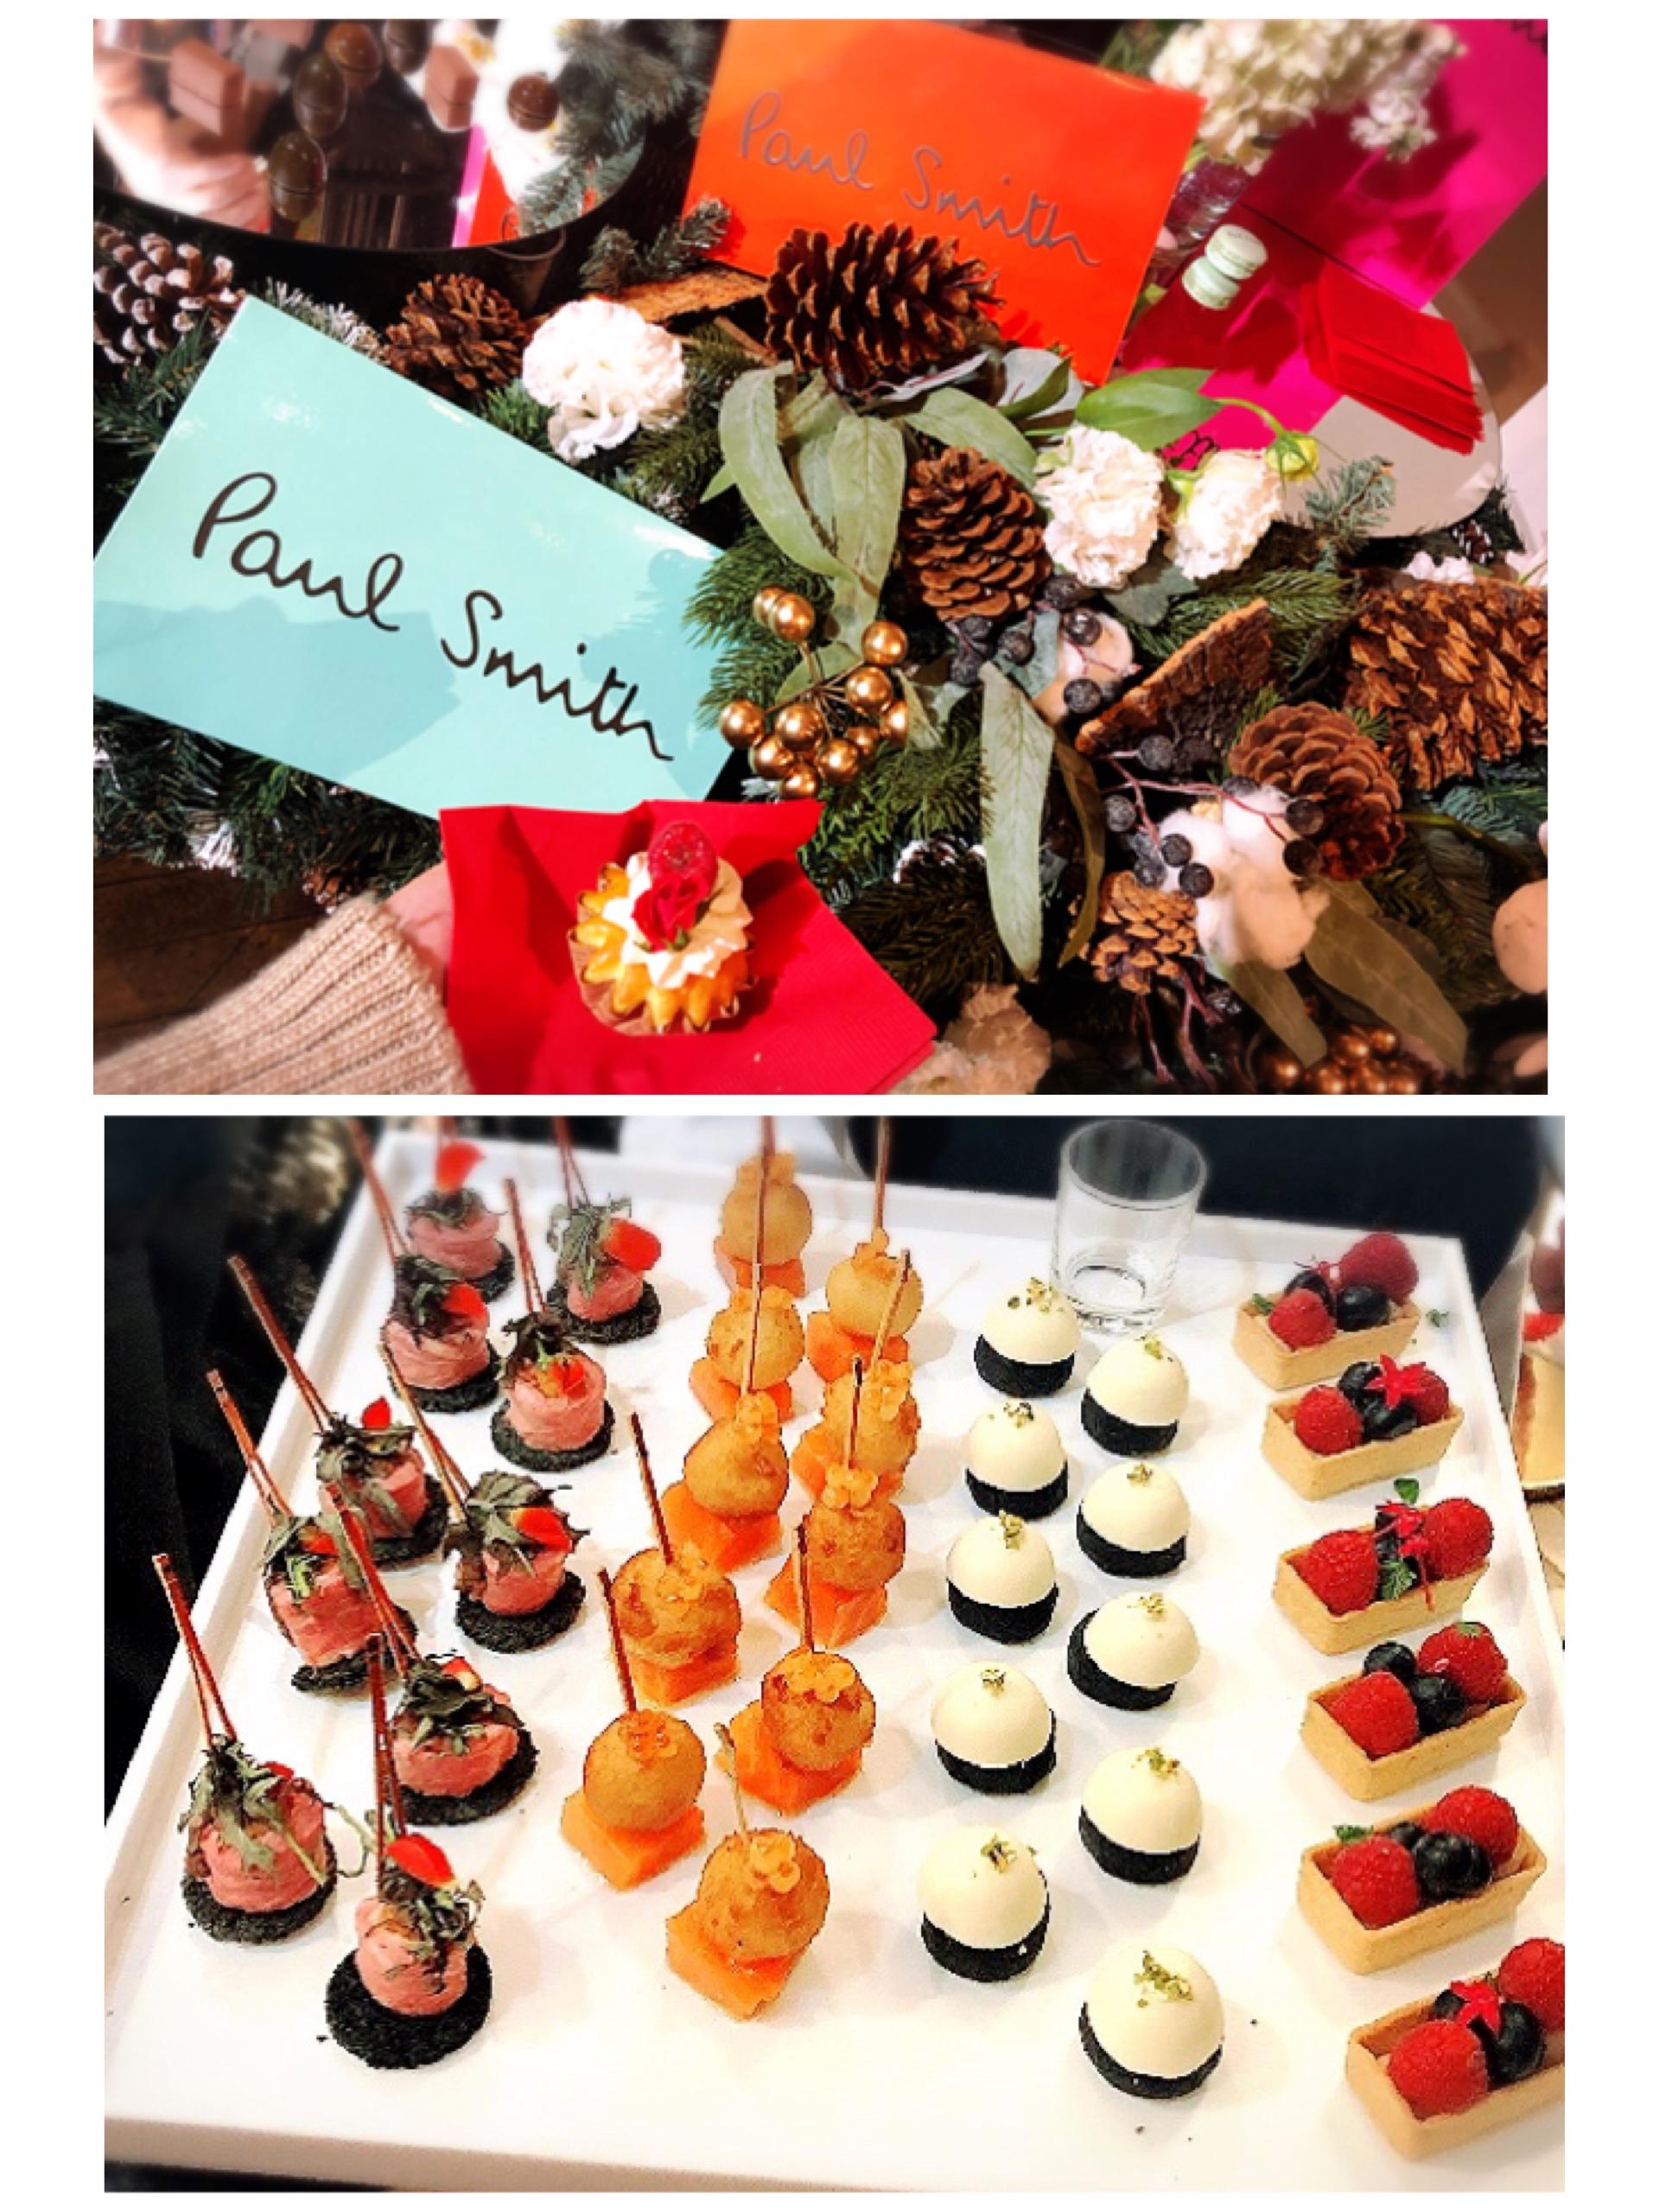 【Paul Smith × MEN'S NON-NO × MORE 】クリスマスイベント・トークショー✴︎.*。イベント限定トートバッグも˚✧おしゃれ空間でショッピング(*´꒳`*)_5